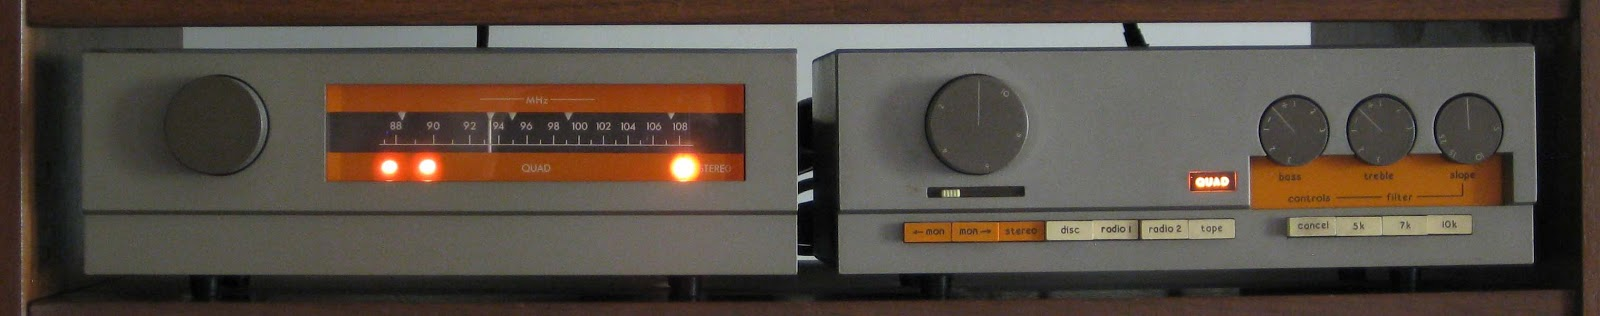 rare manual depository the quad 33 control amplifier the quad 303 rh raremanualdepository blogspot com FM3 Performance Marketing FM3 Visa Application Form